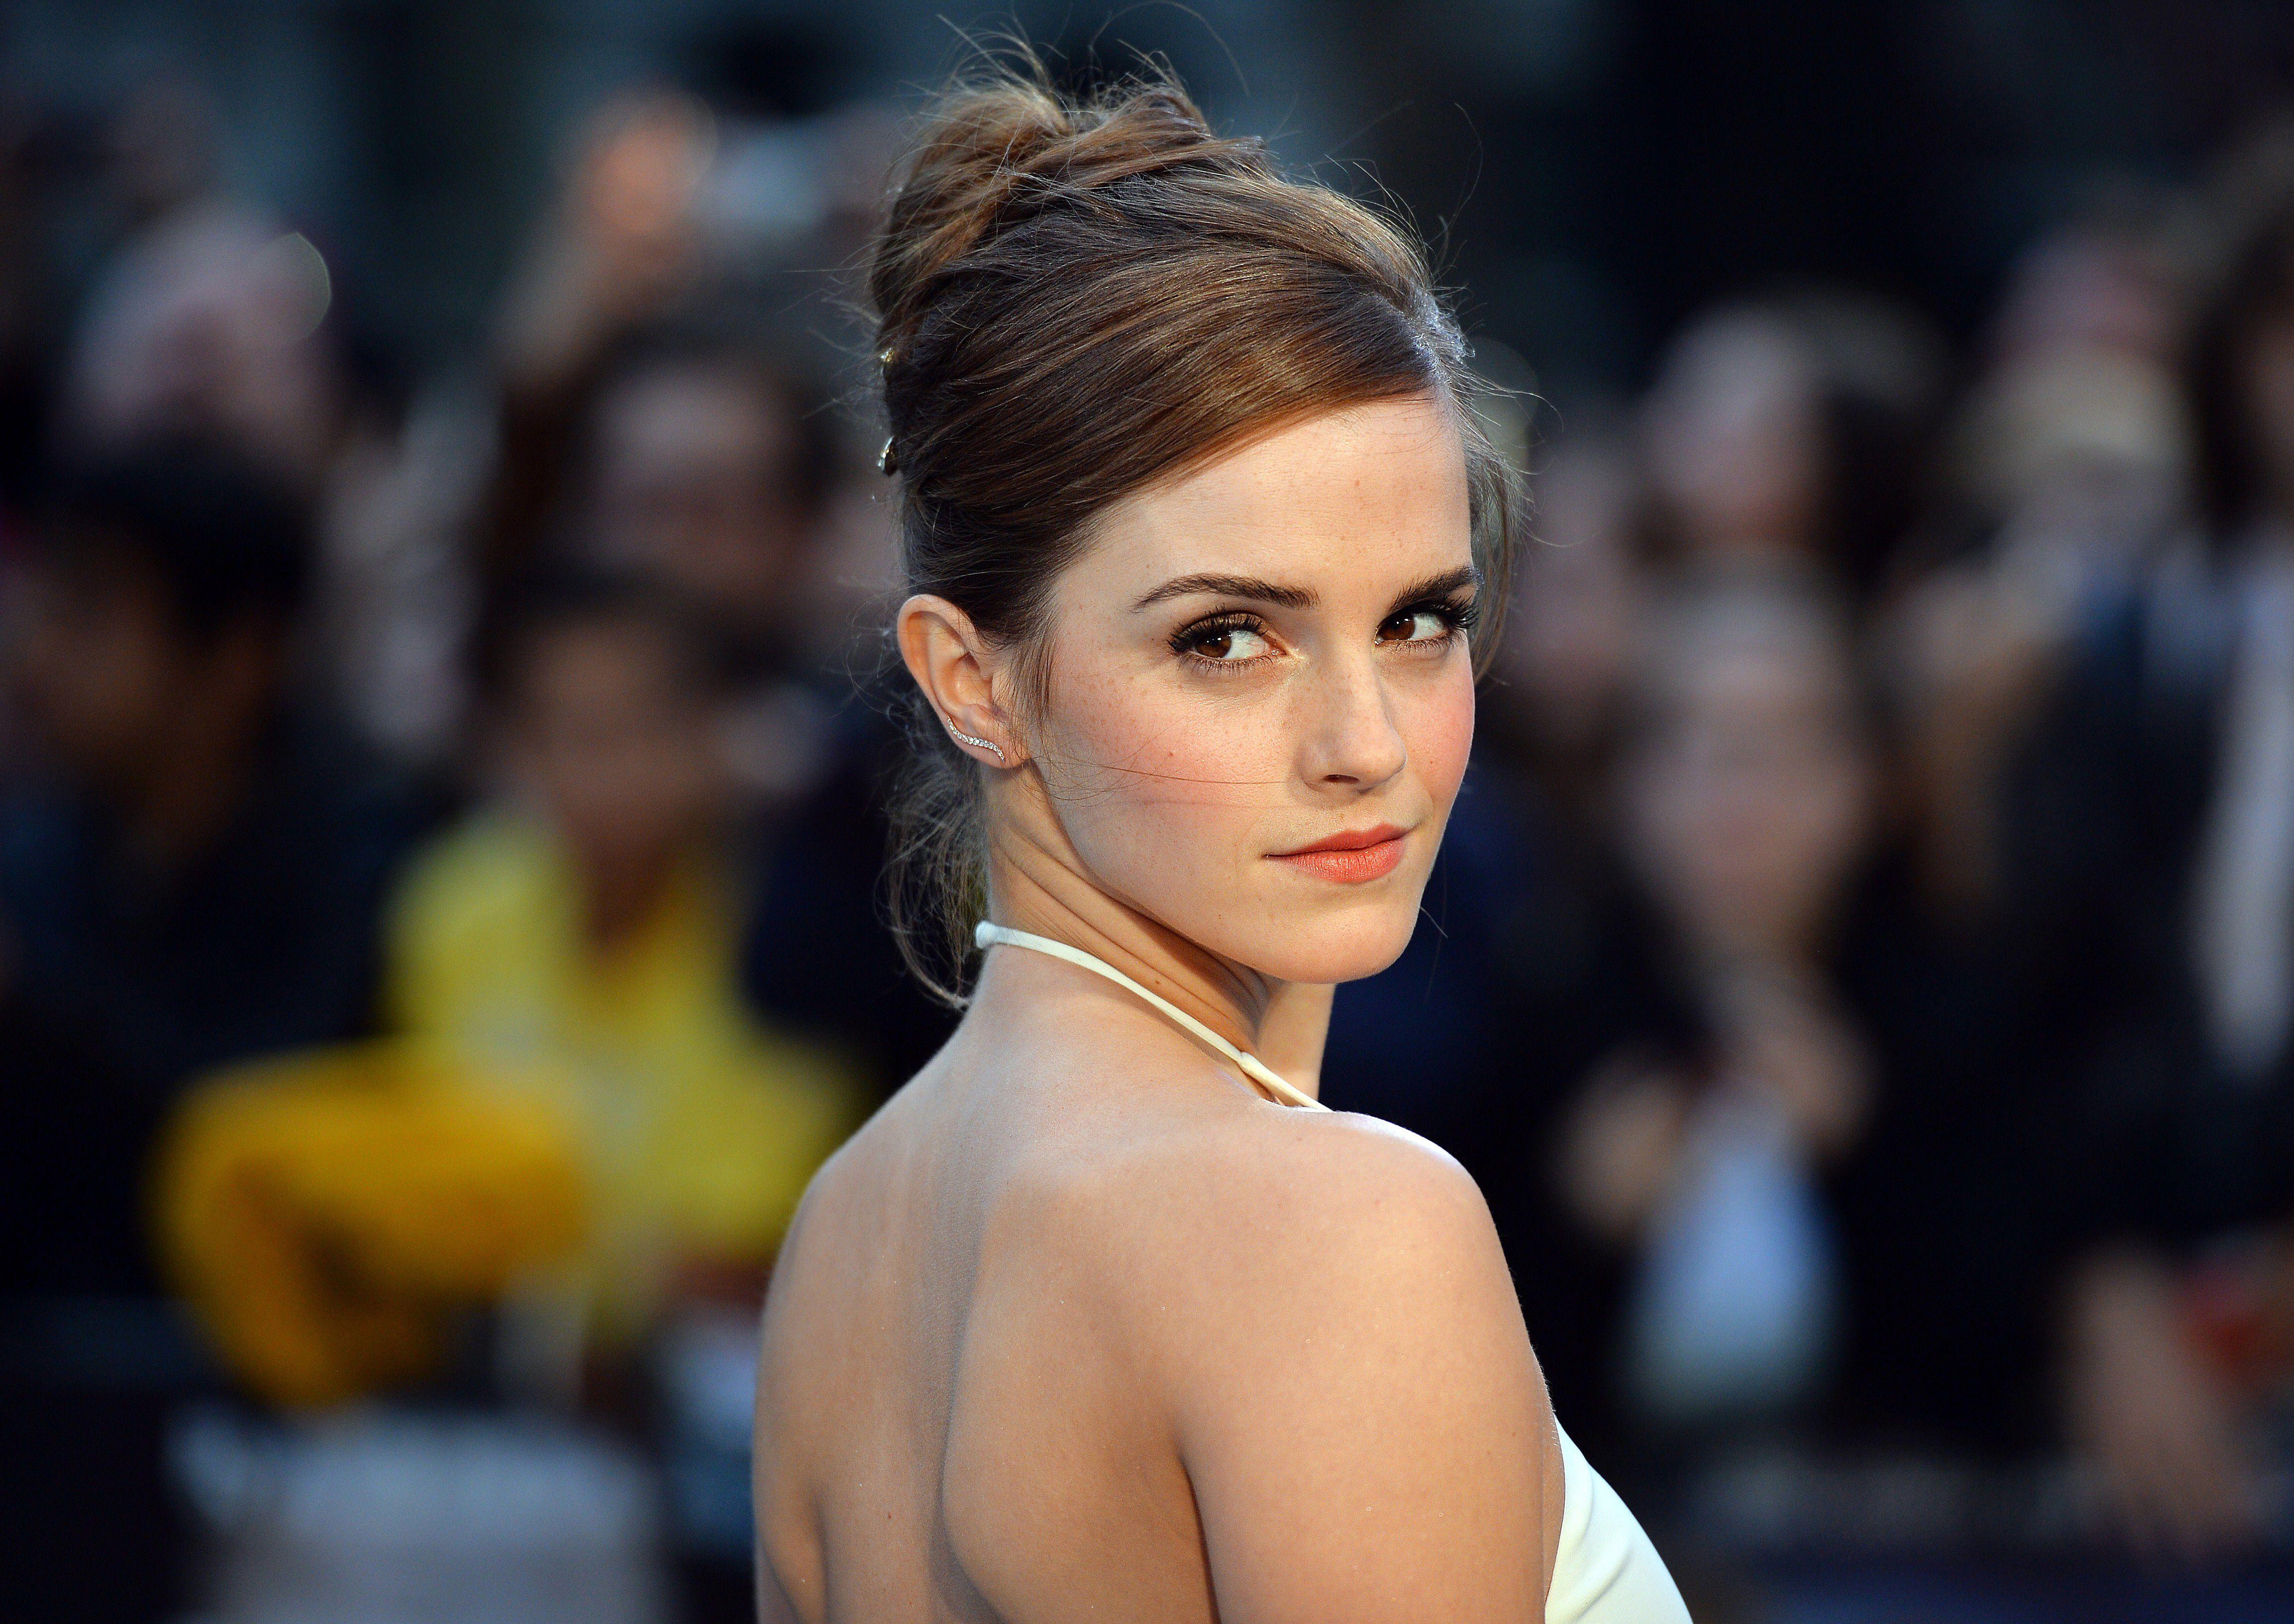 emma watson 17 Best images about Emma Watson on Pinterest   Emma watson elle, Oscar de  la Renta and Emma watson makeup